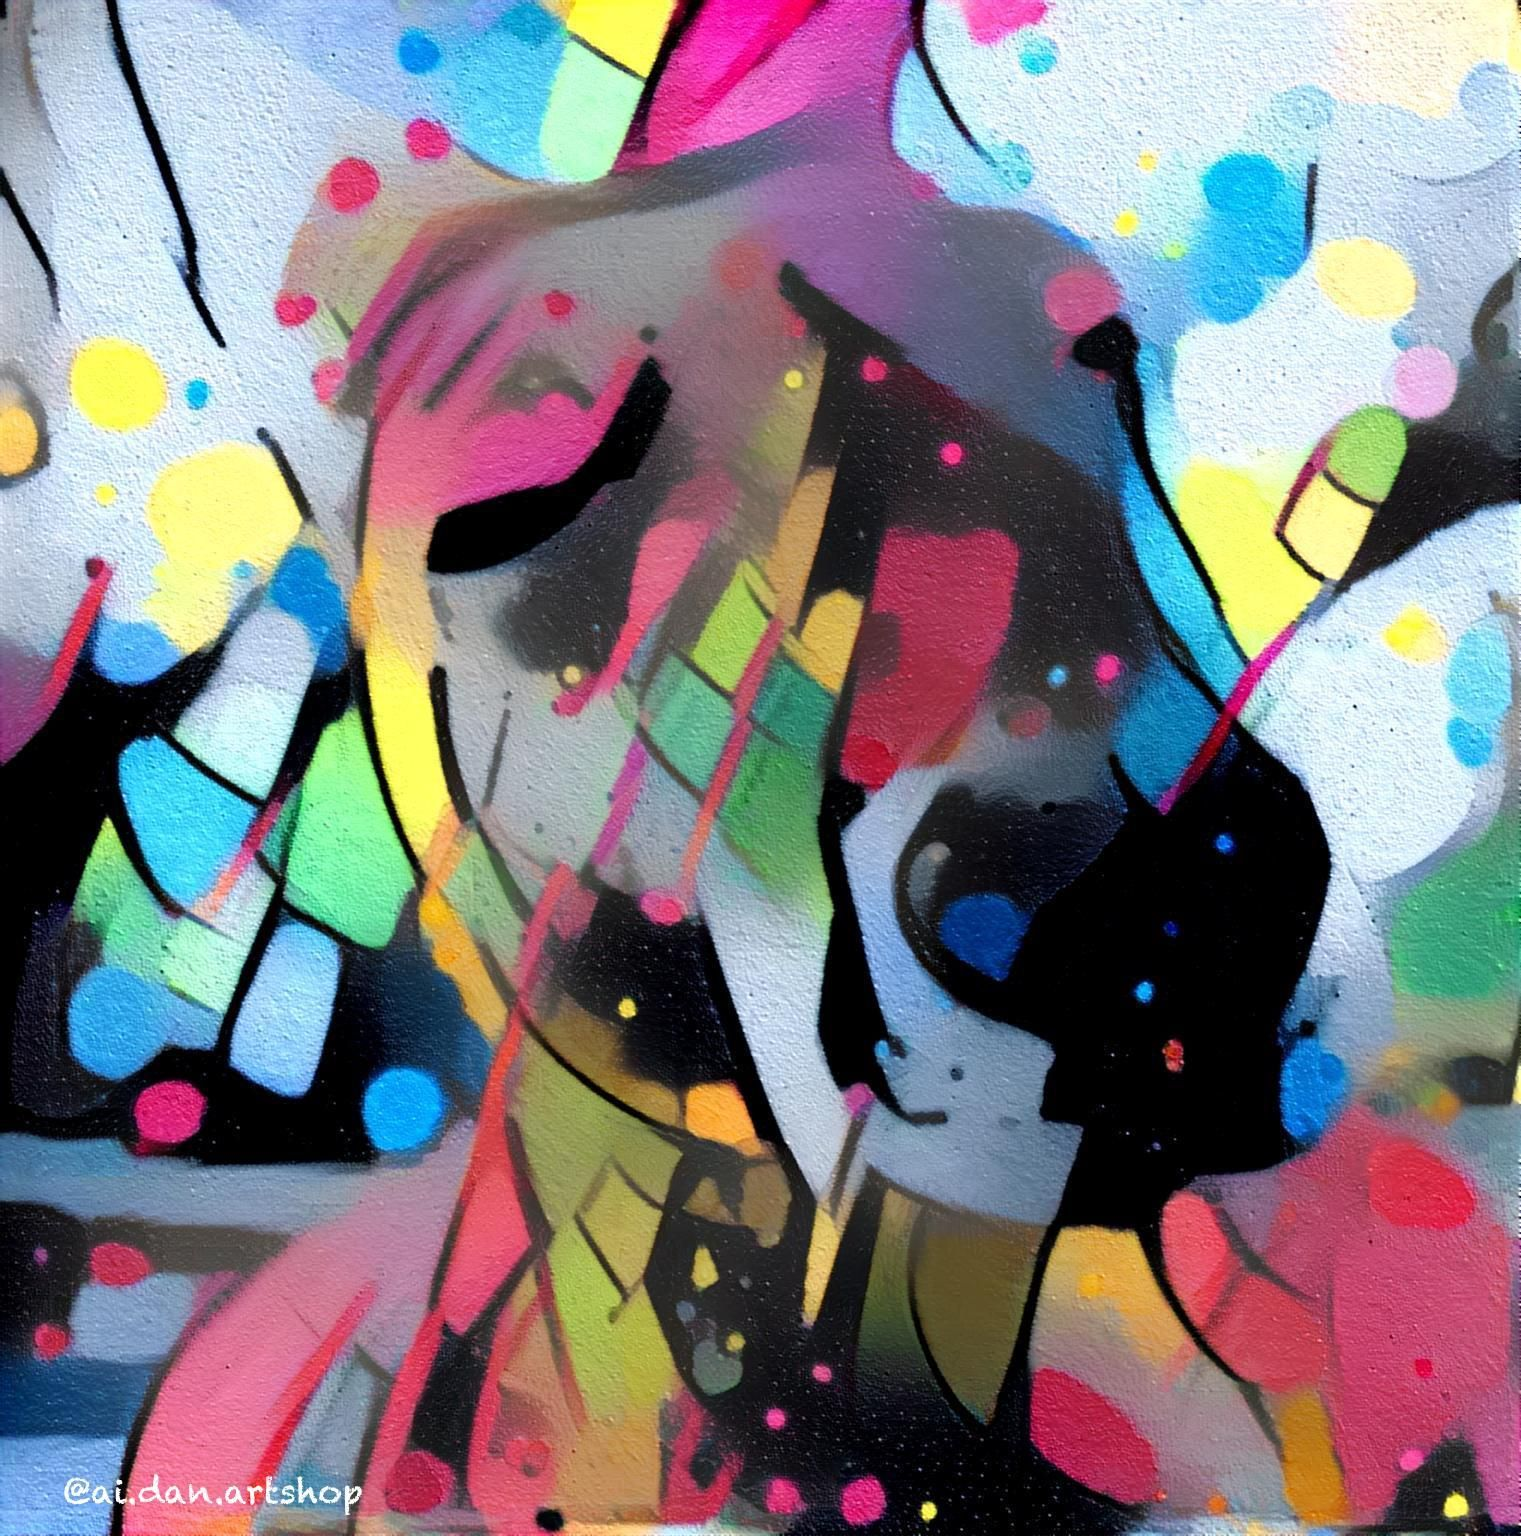 Kangaroovy digital graffiti iftvunzj art